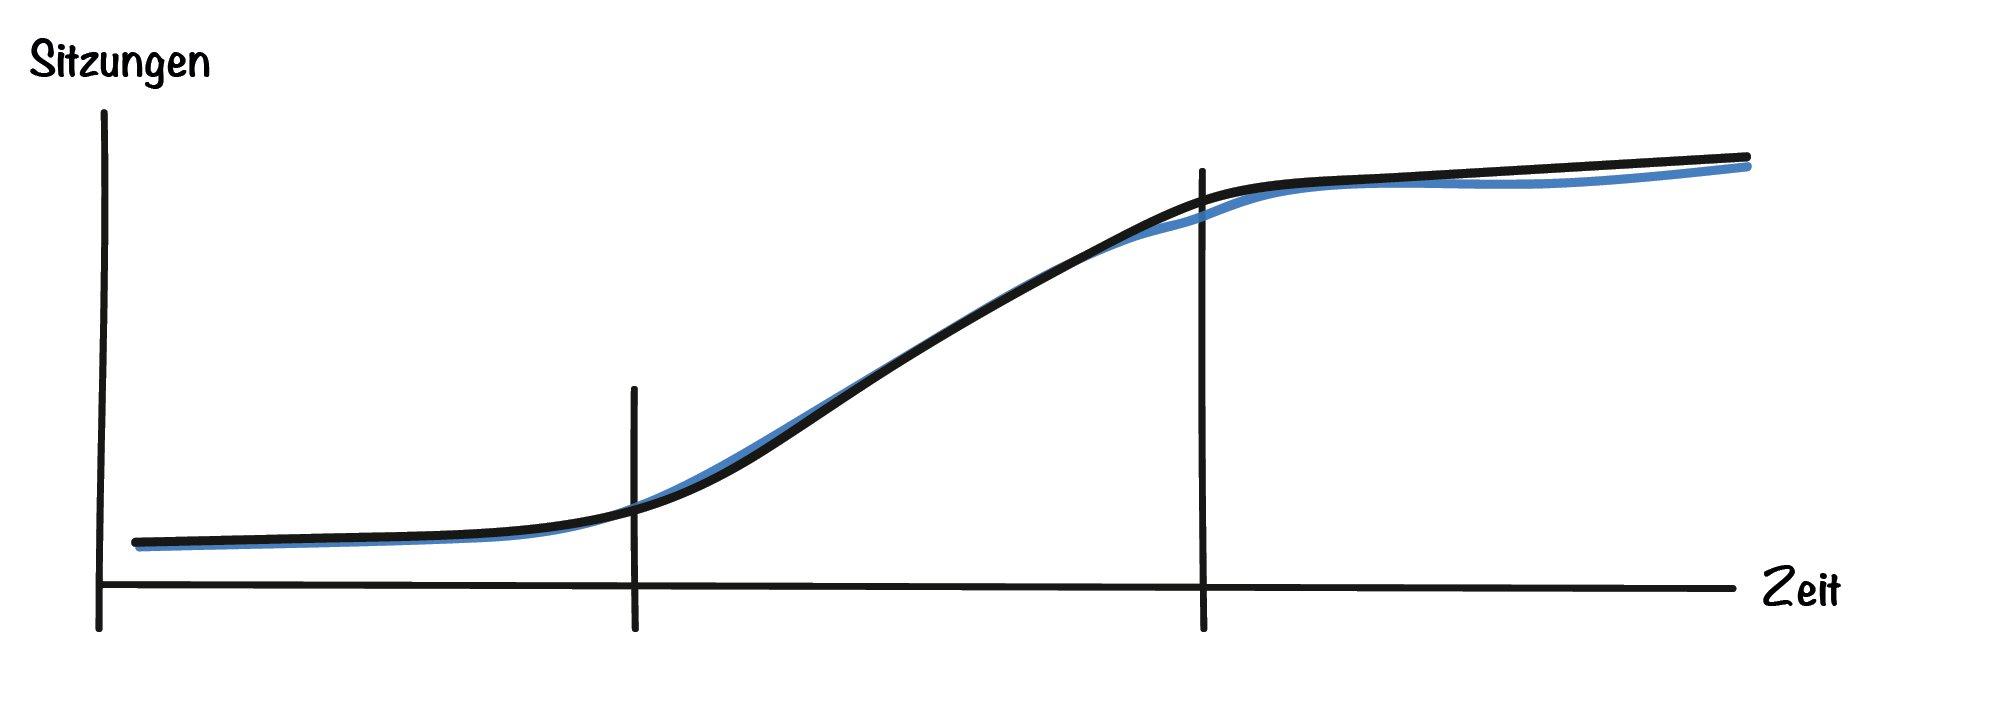 grafik-3